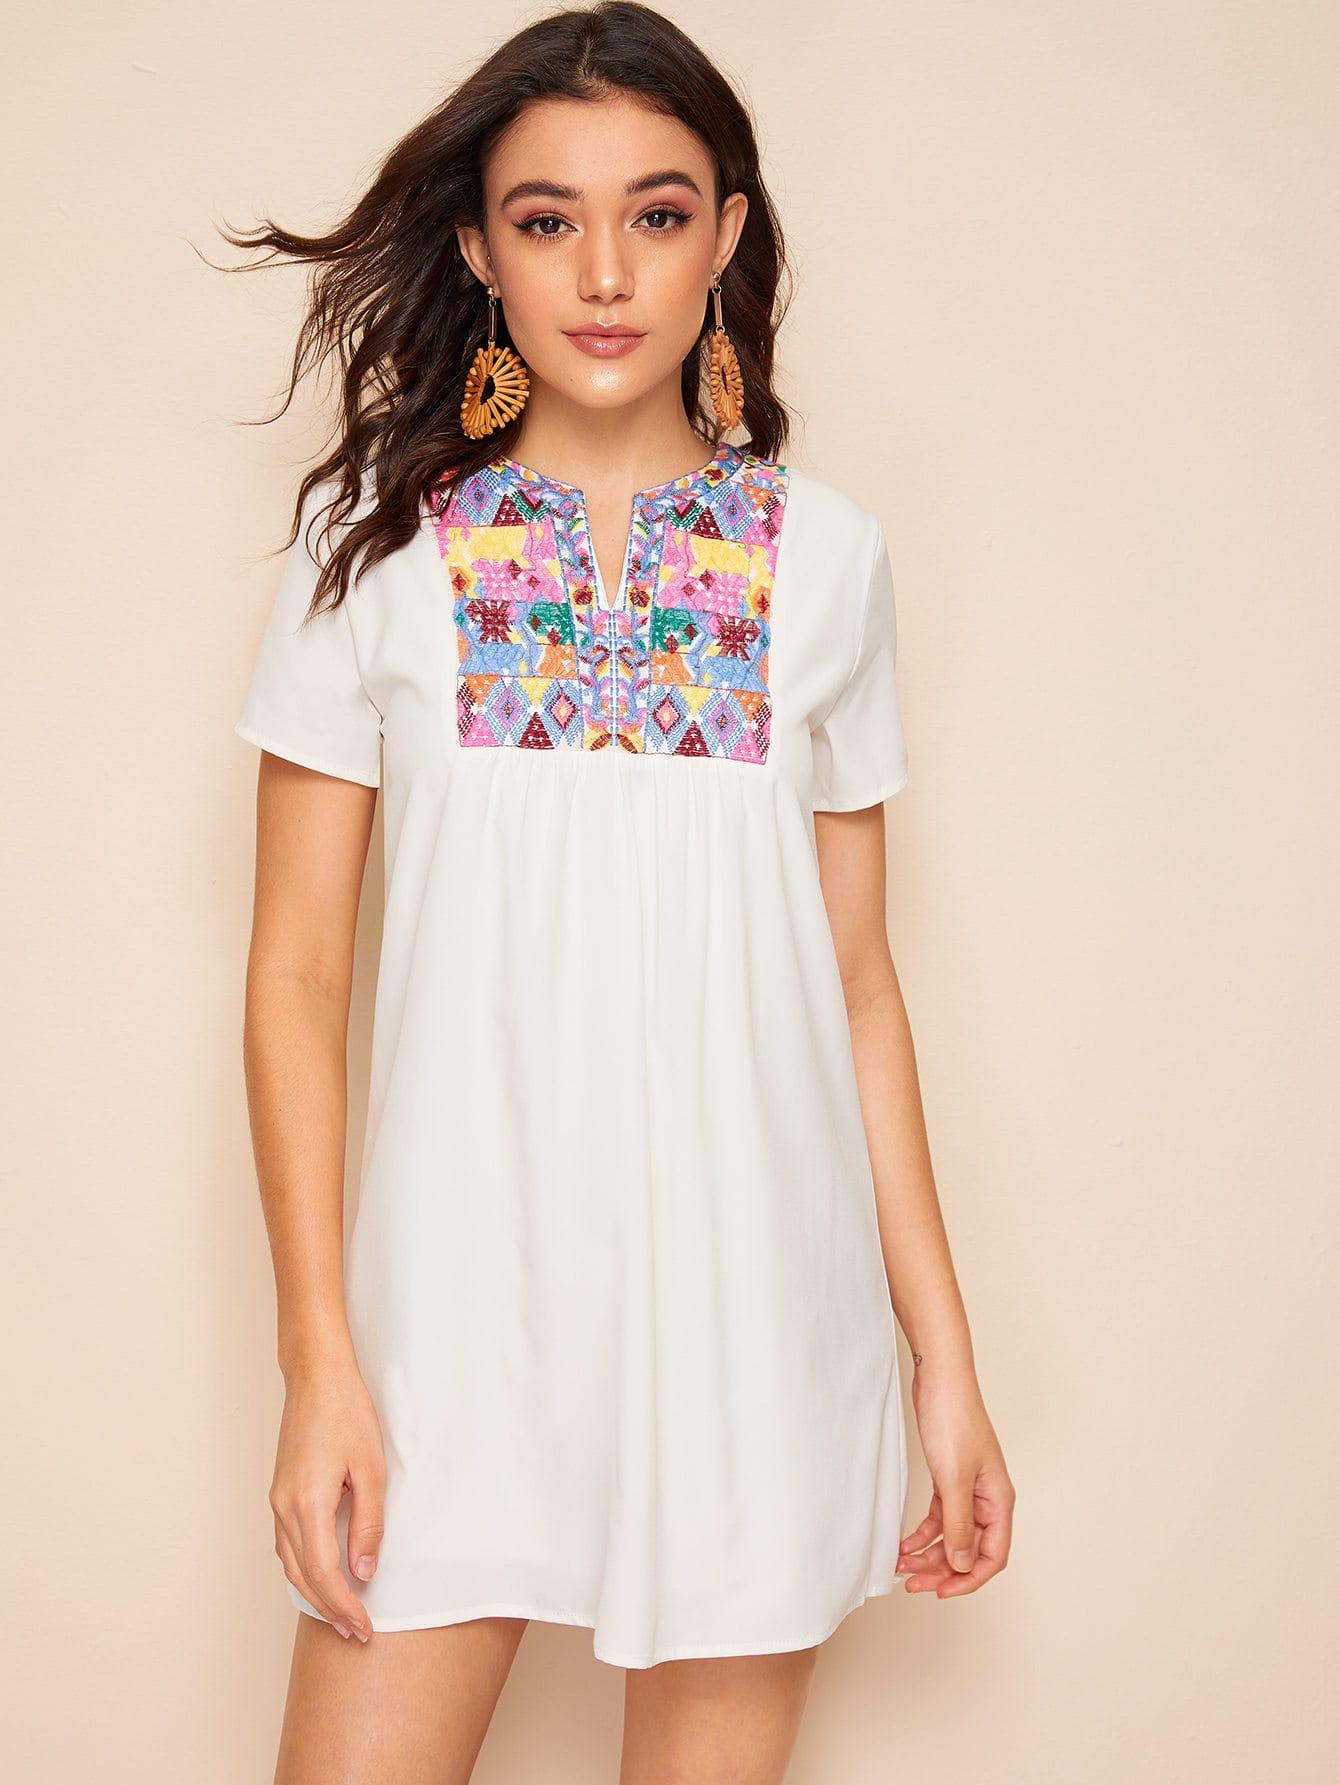 Фото 6 - Многослойная блуза с завязкой и пуговицами от SheIn белого цвета